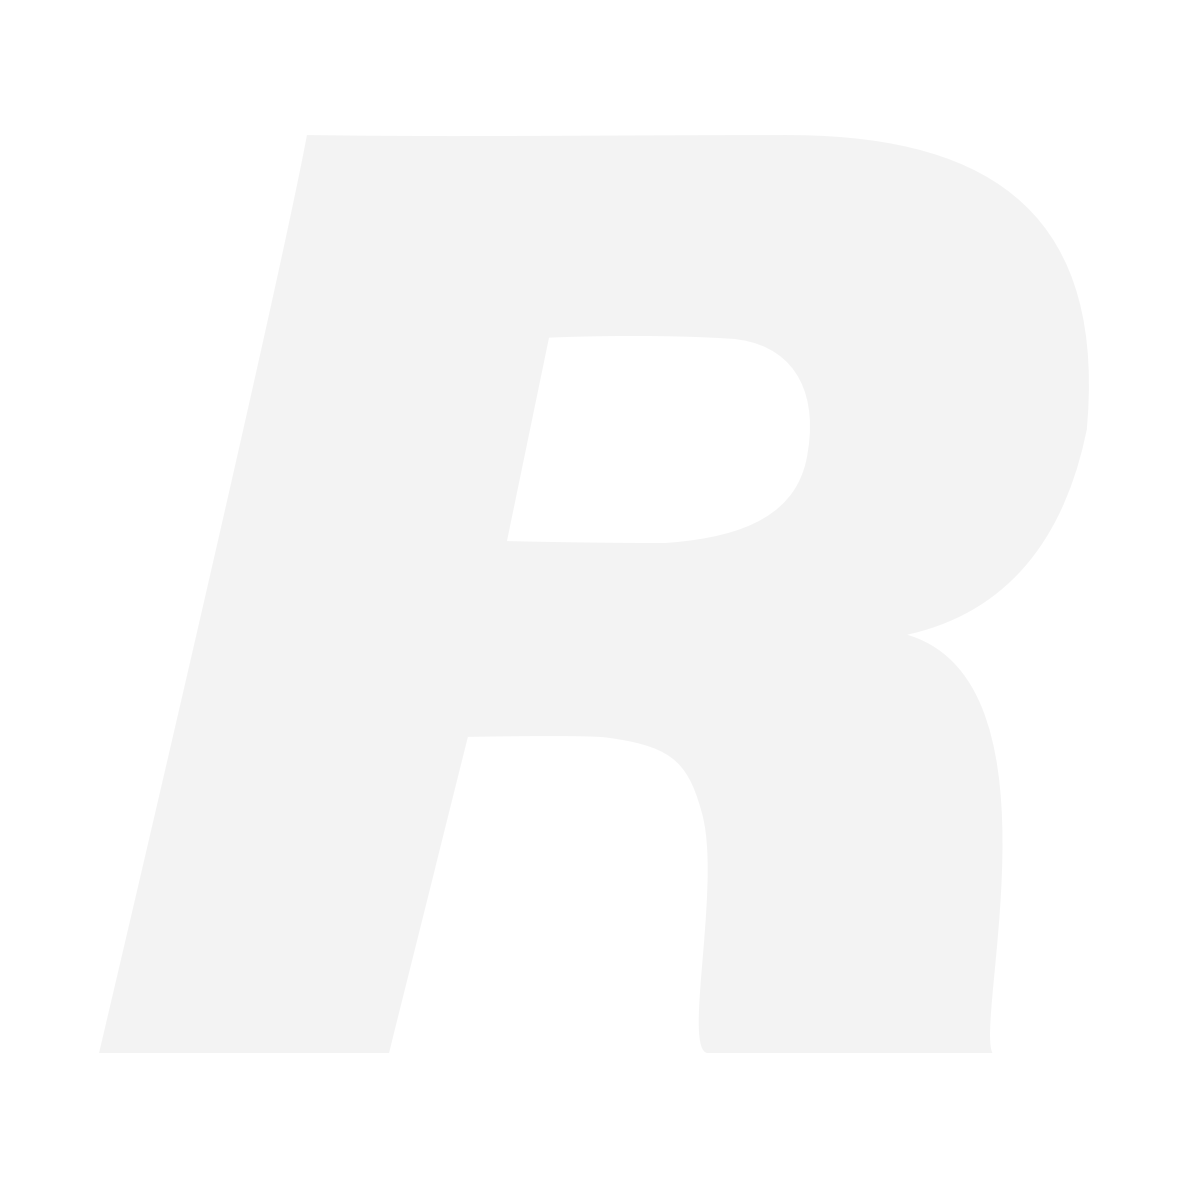 Tamron AF 16-300/3.5-6.3 Di II PZD -objektiv, Sony A